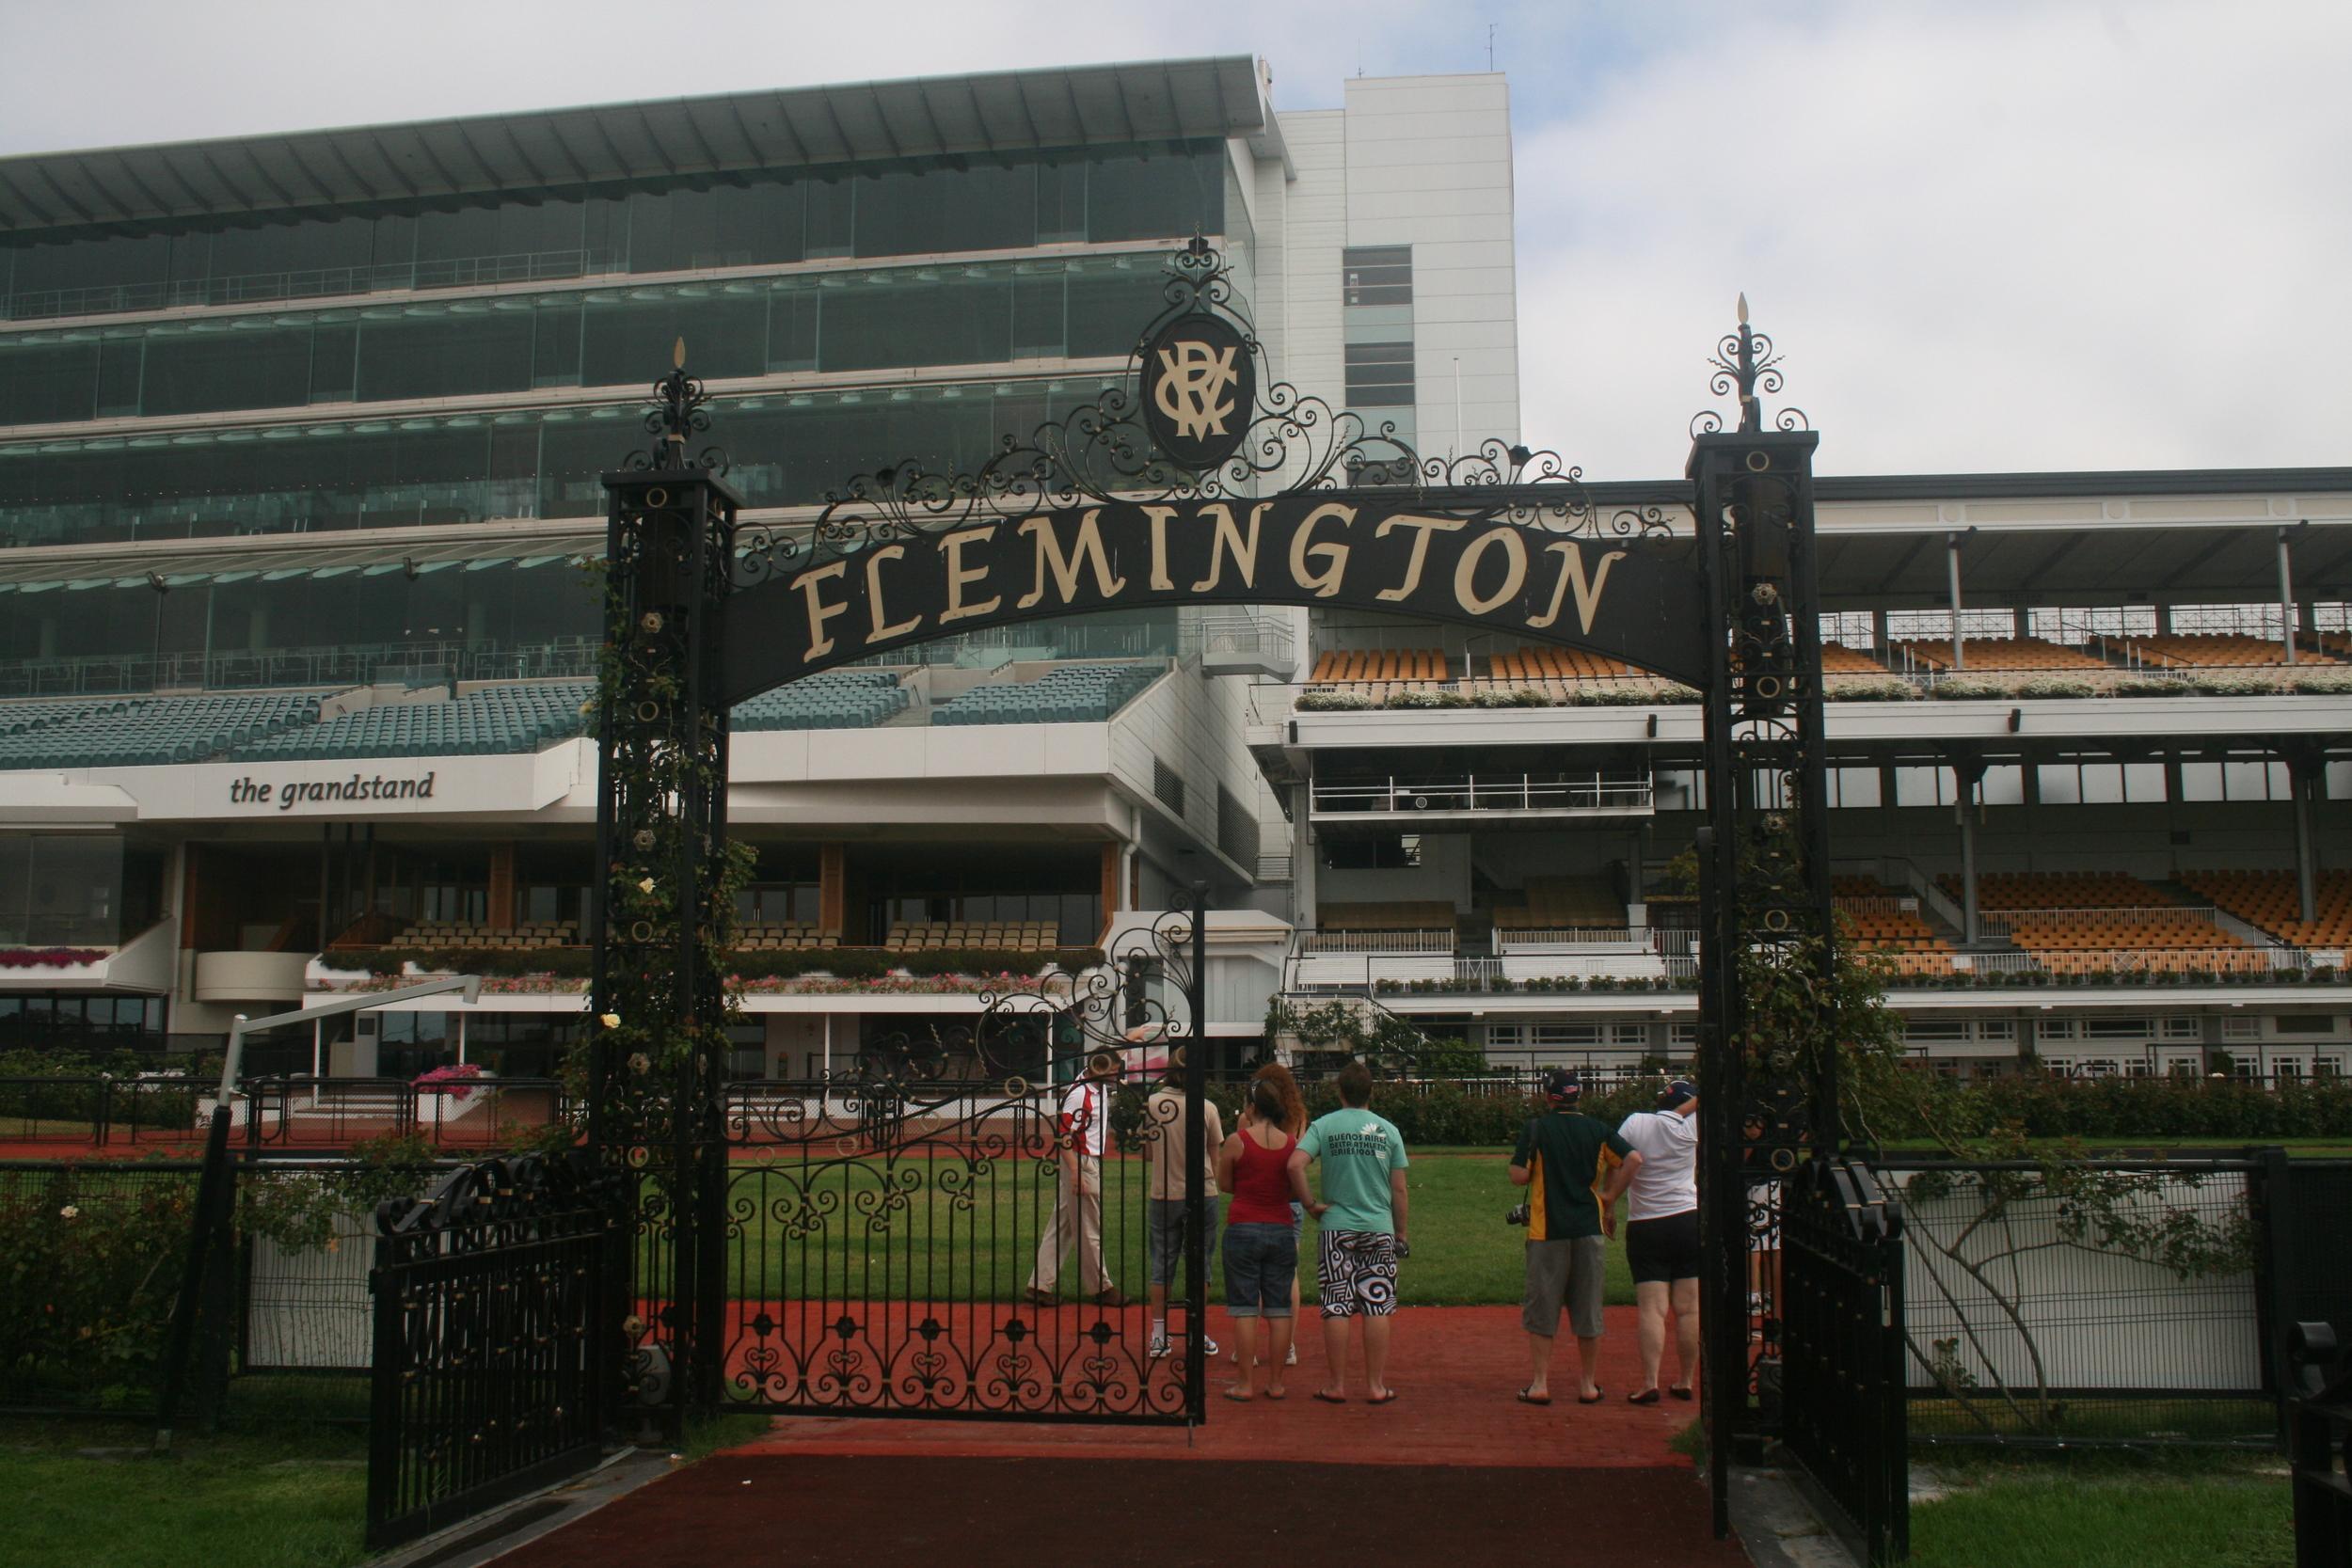 Flemington 0209 on tour.jpg